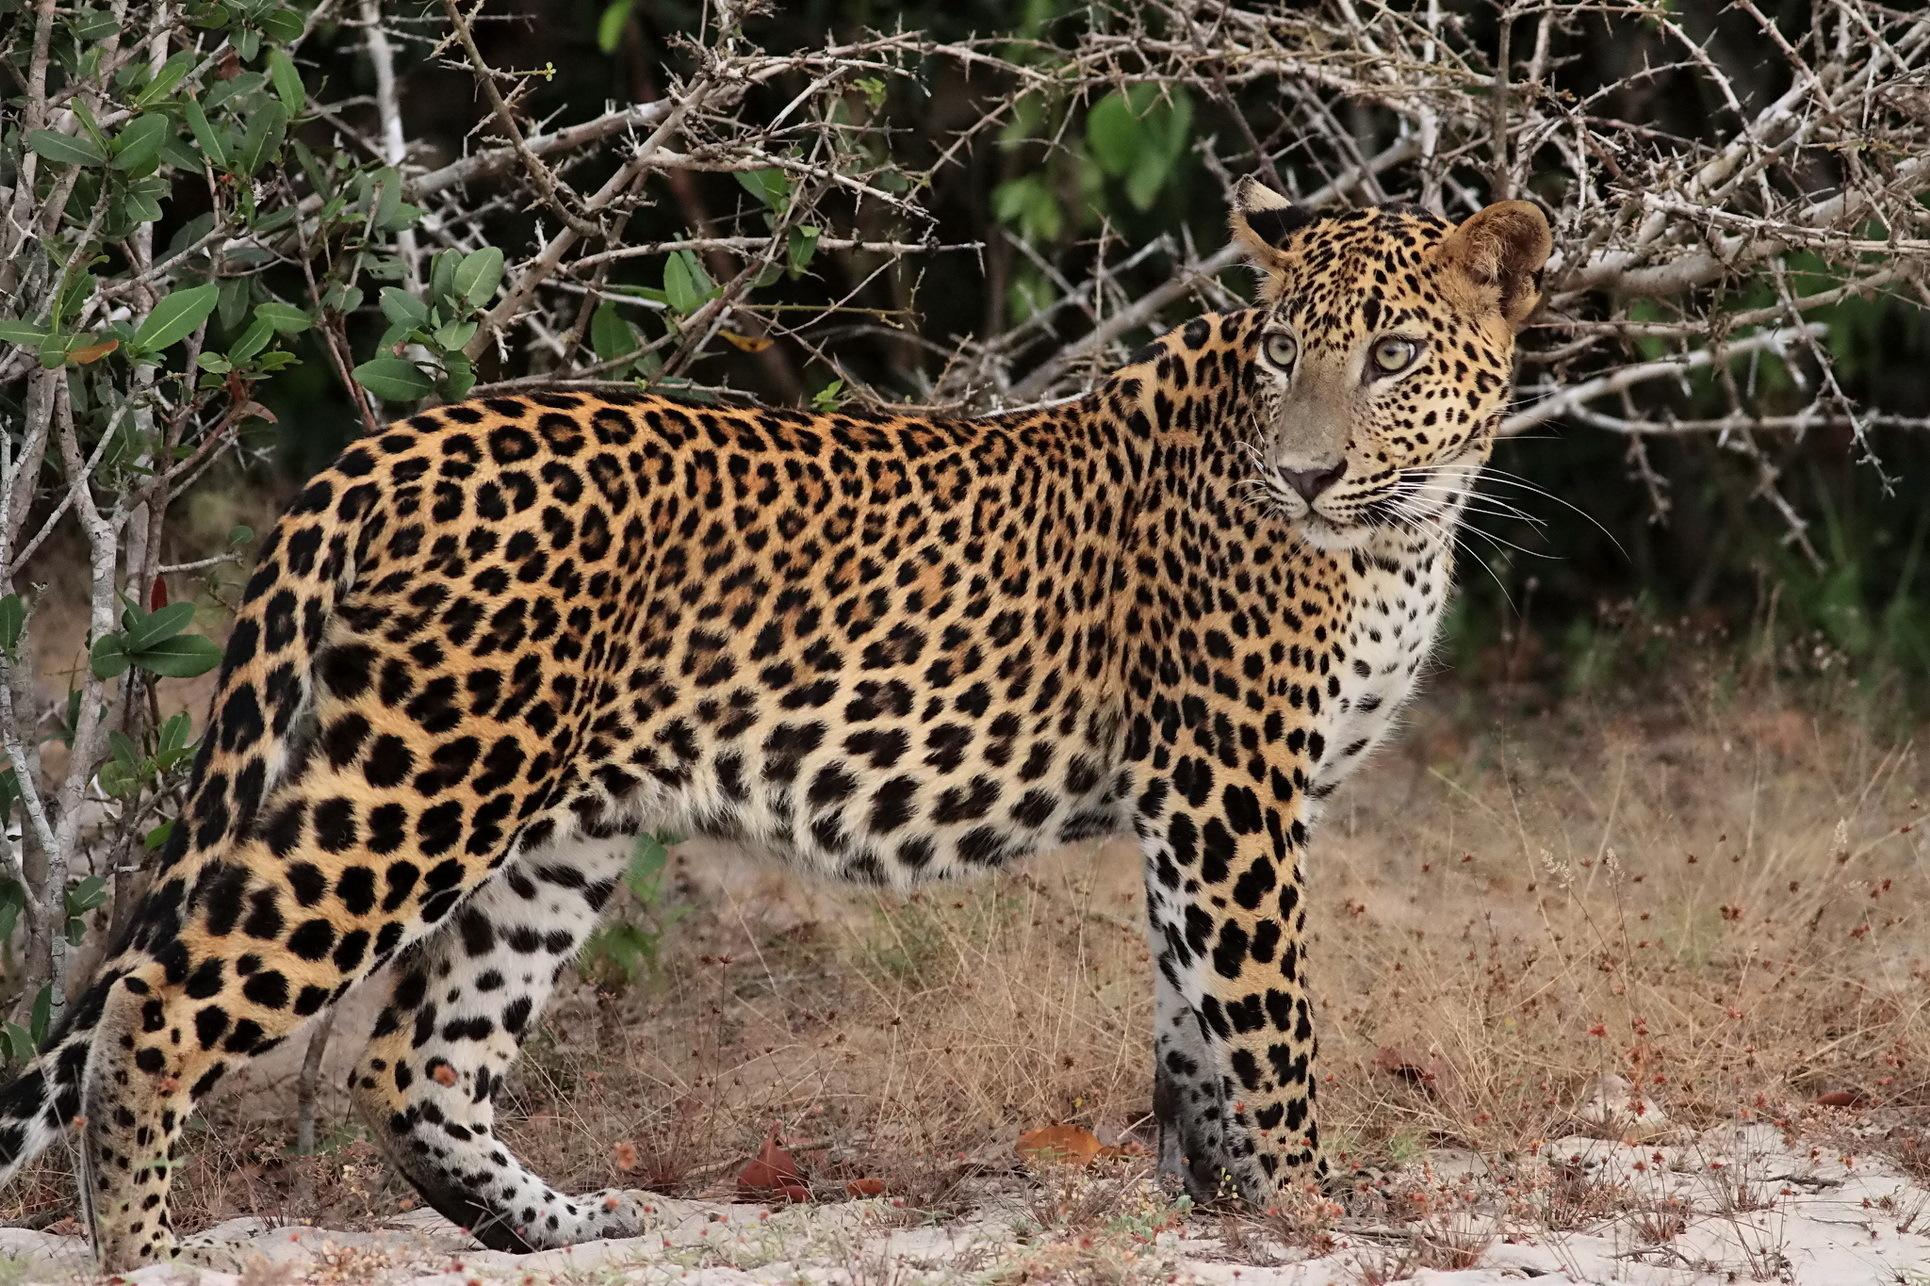 mutant leopards the messybeast - HD1600×1000